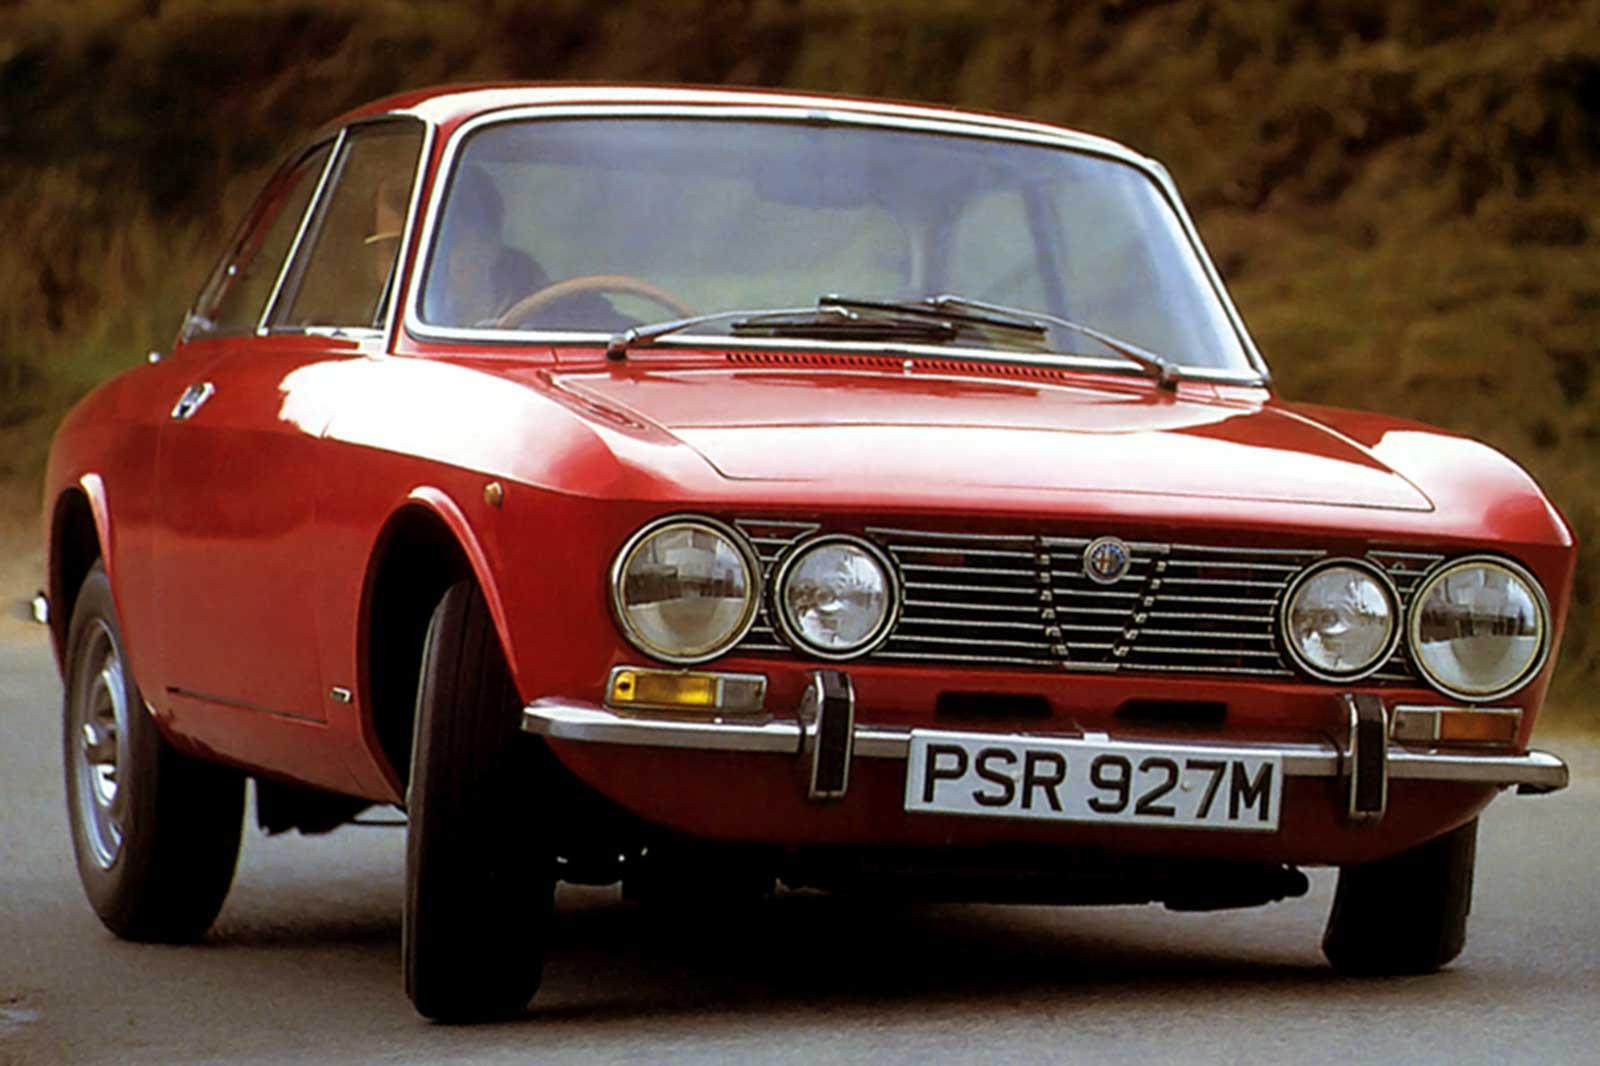 Throwback Thursday 1972: Datsun 240Z vs Alfa Romeo 2000 GTV